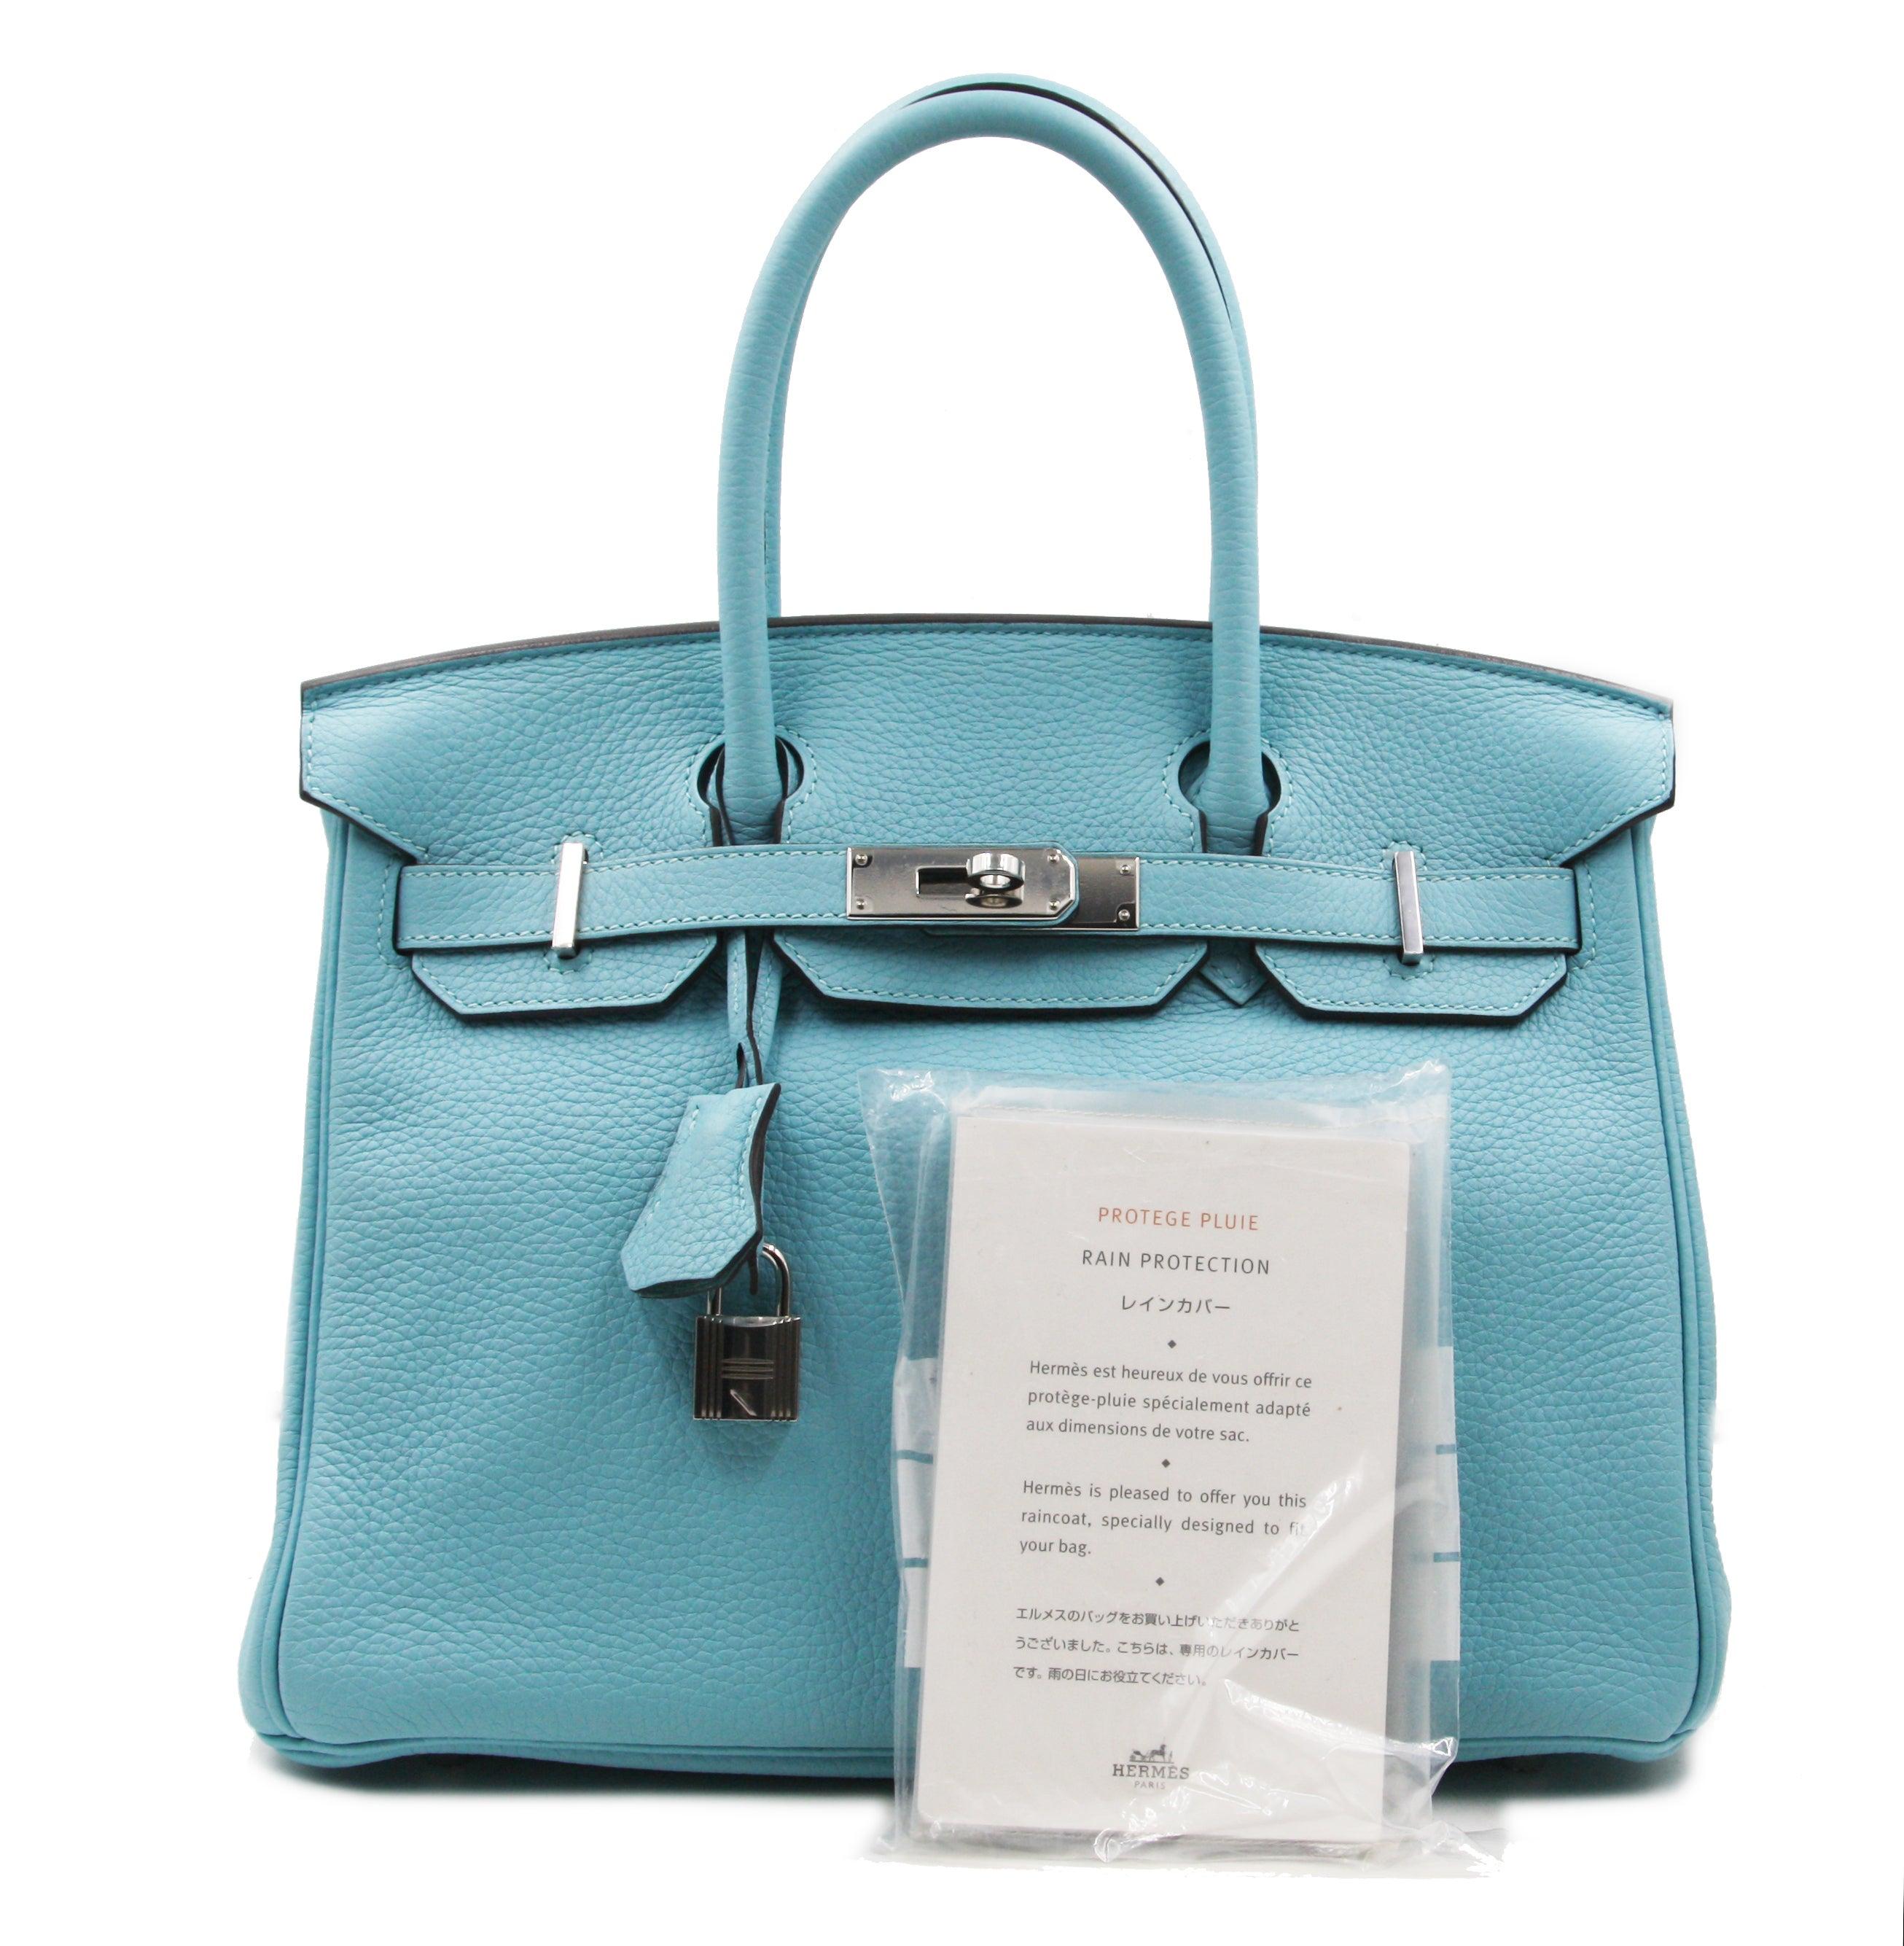 fae29e025174 Hermes Birkin 30 Togo Blue Atoll 3p Palladium (silver) Tote Bag at 1stdibs